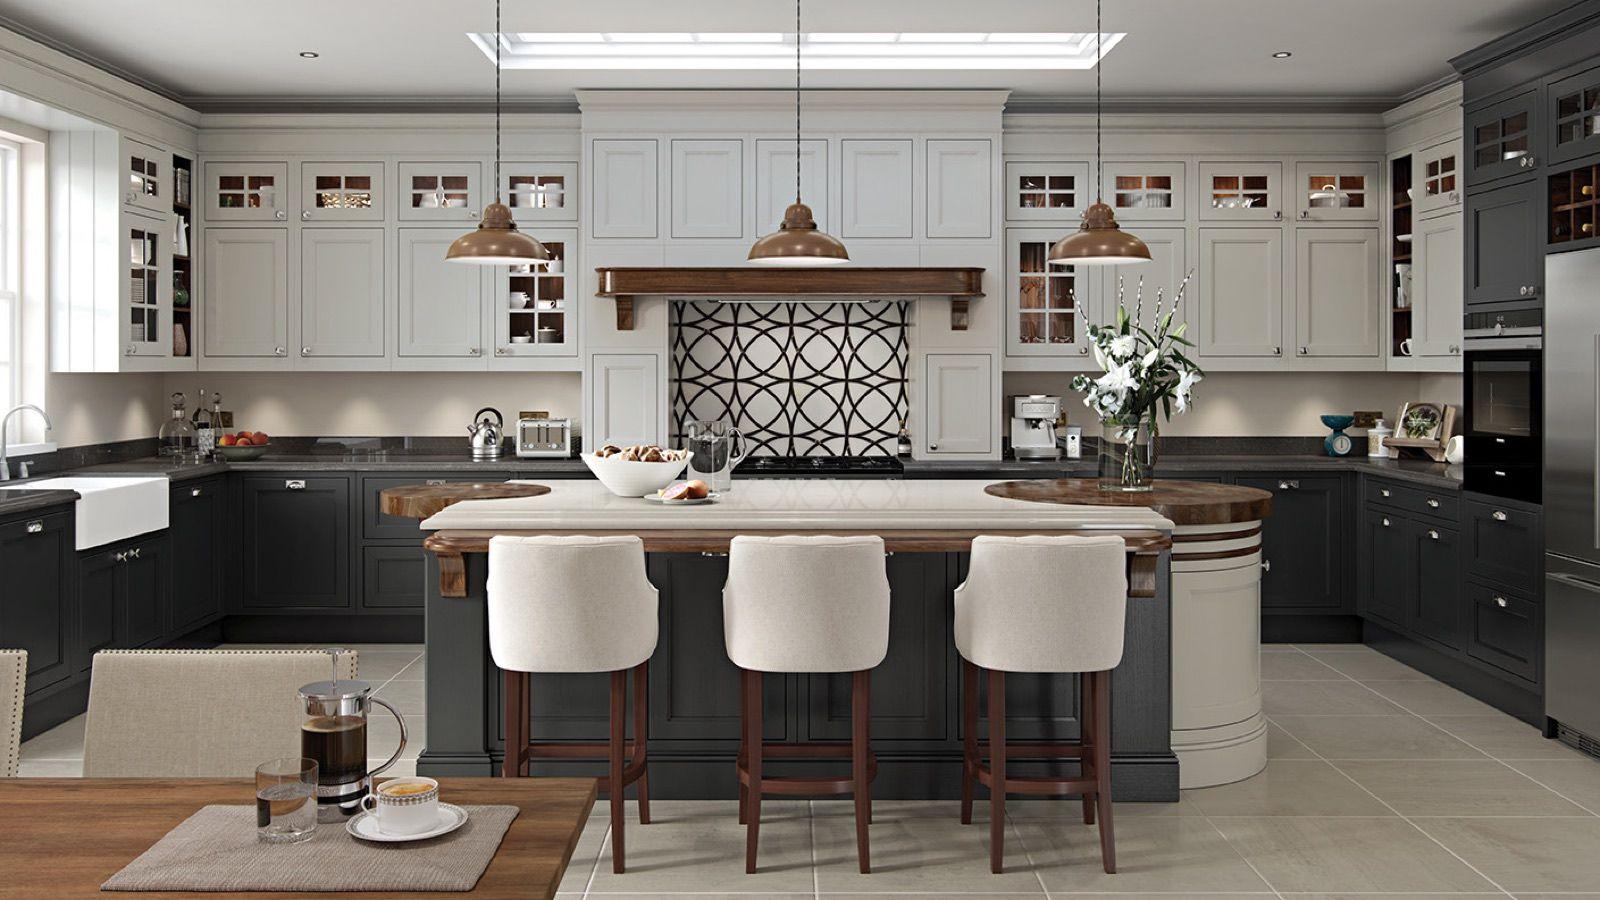 Luxury Graphite Color Kitchen Cabinets